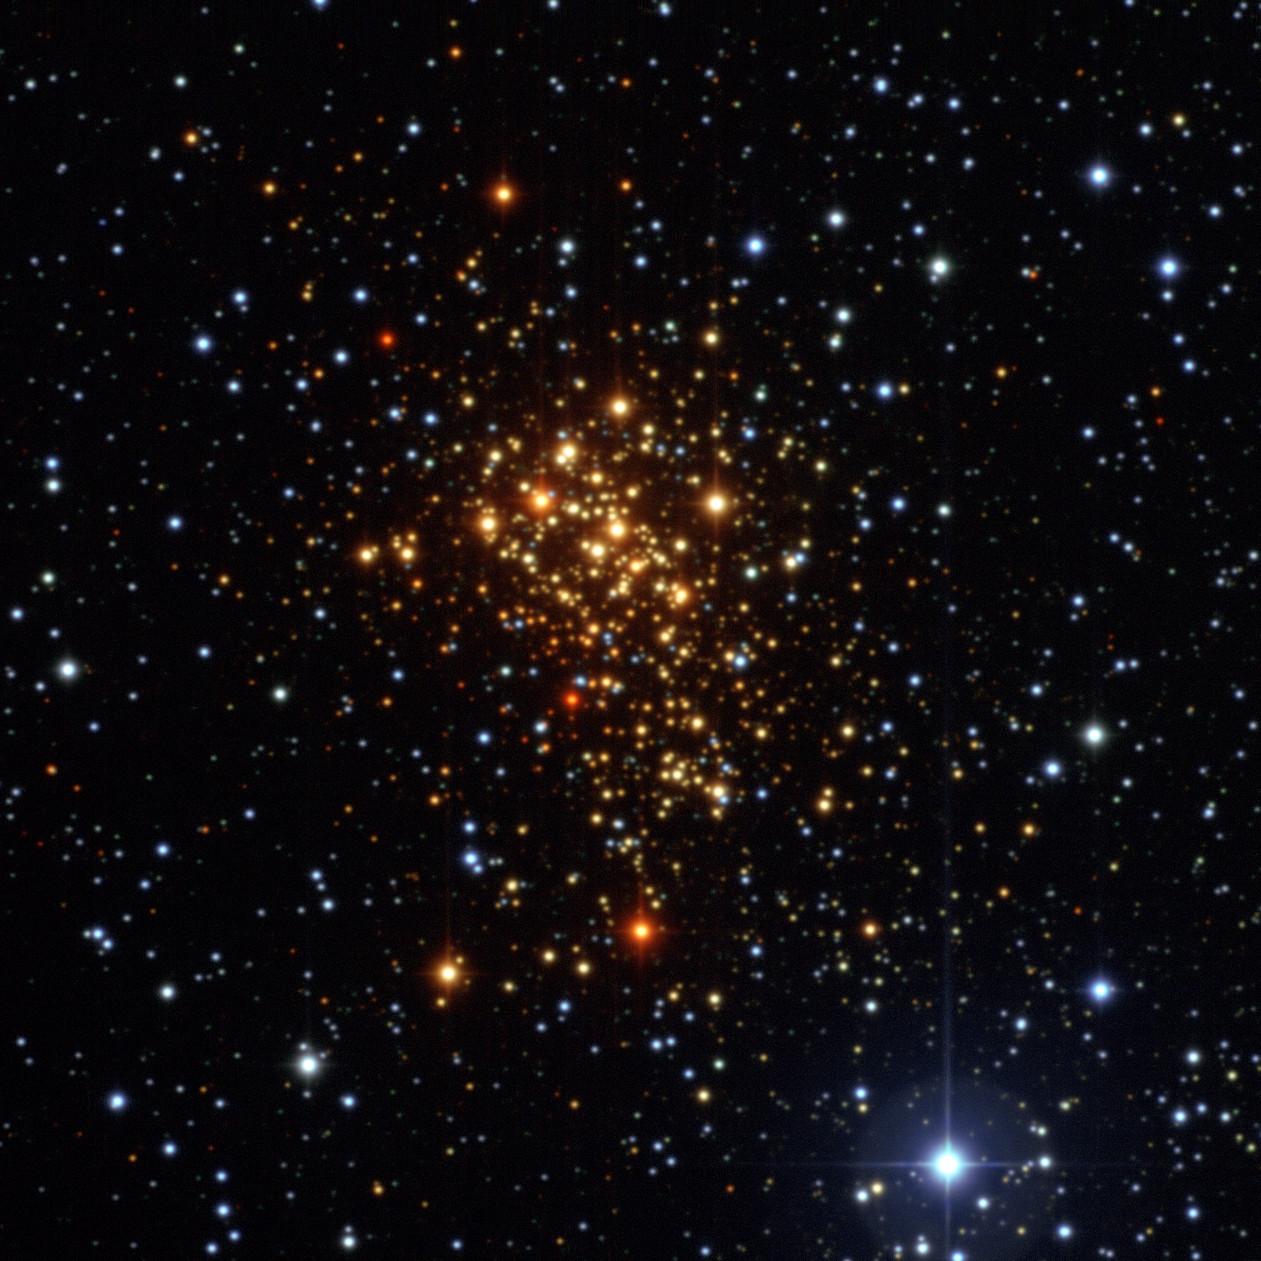 inc amateur astronomers Mary adams